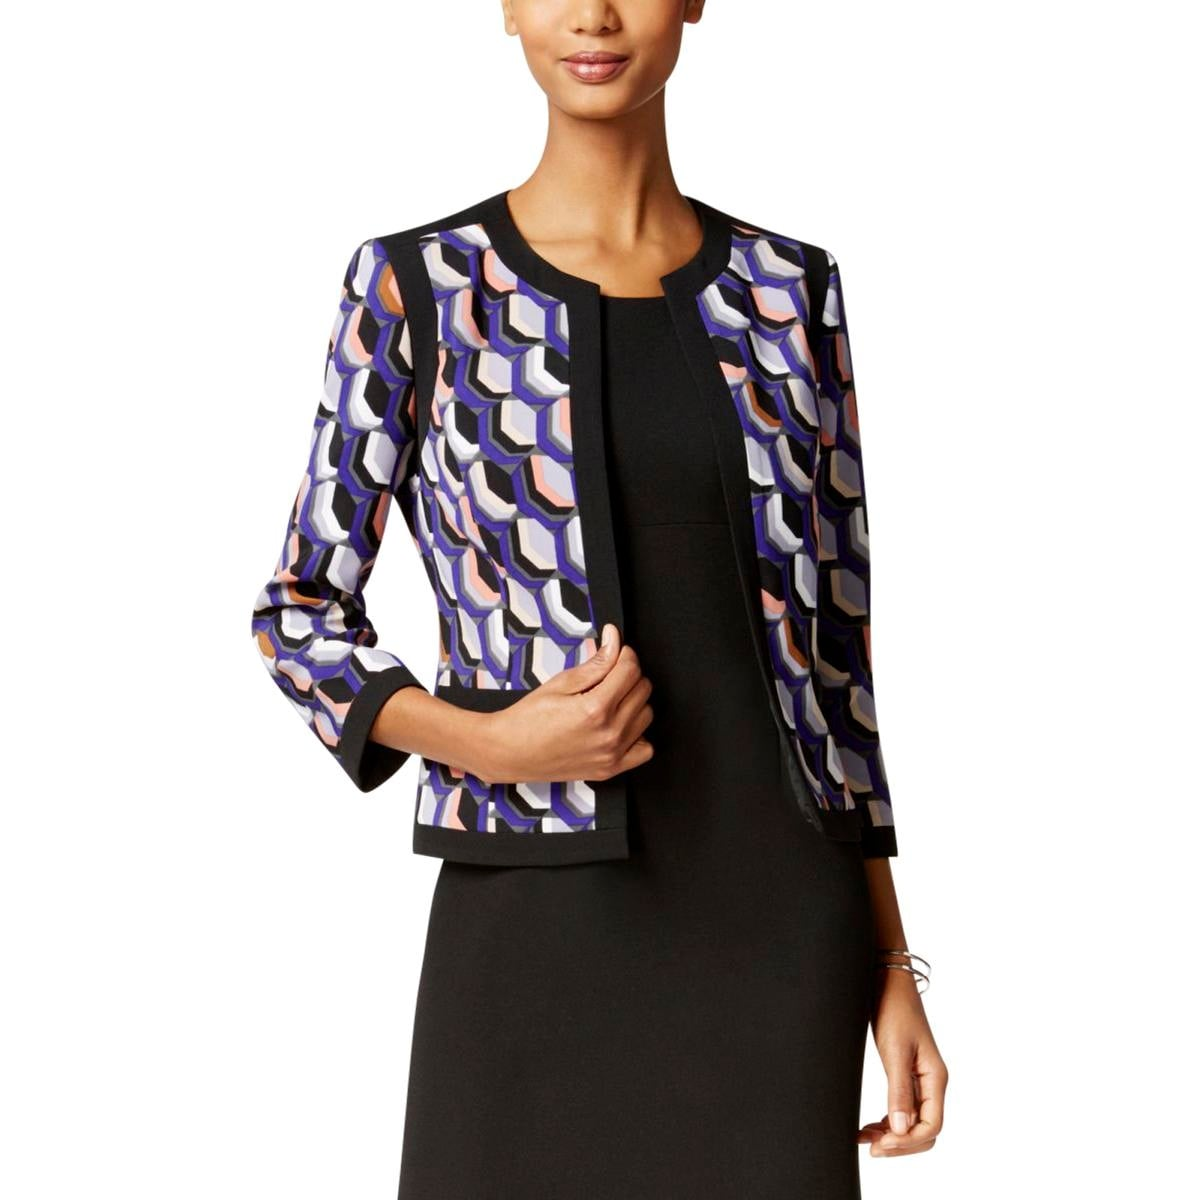 f32b83784b Shop Kasper Womens Open-Front Blazer Twill Pattern - Free Shipping On  Orders Over  45 - Overstock.com - 20667829